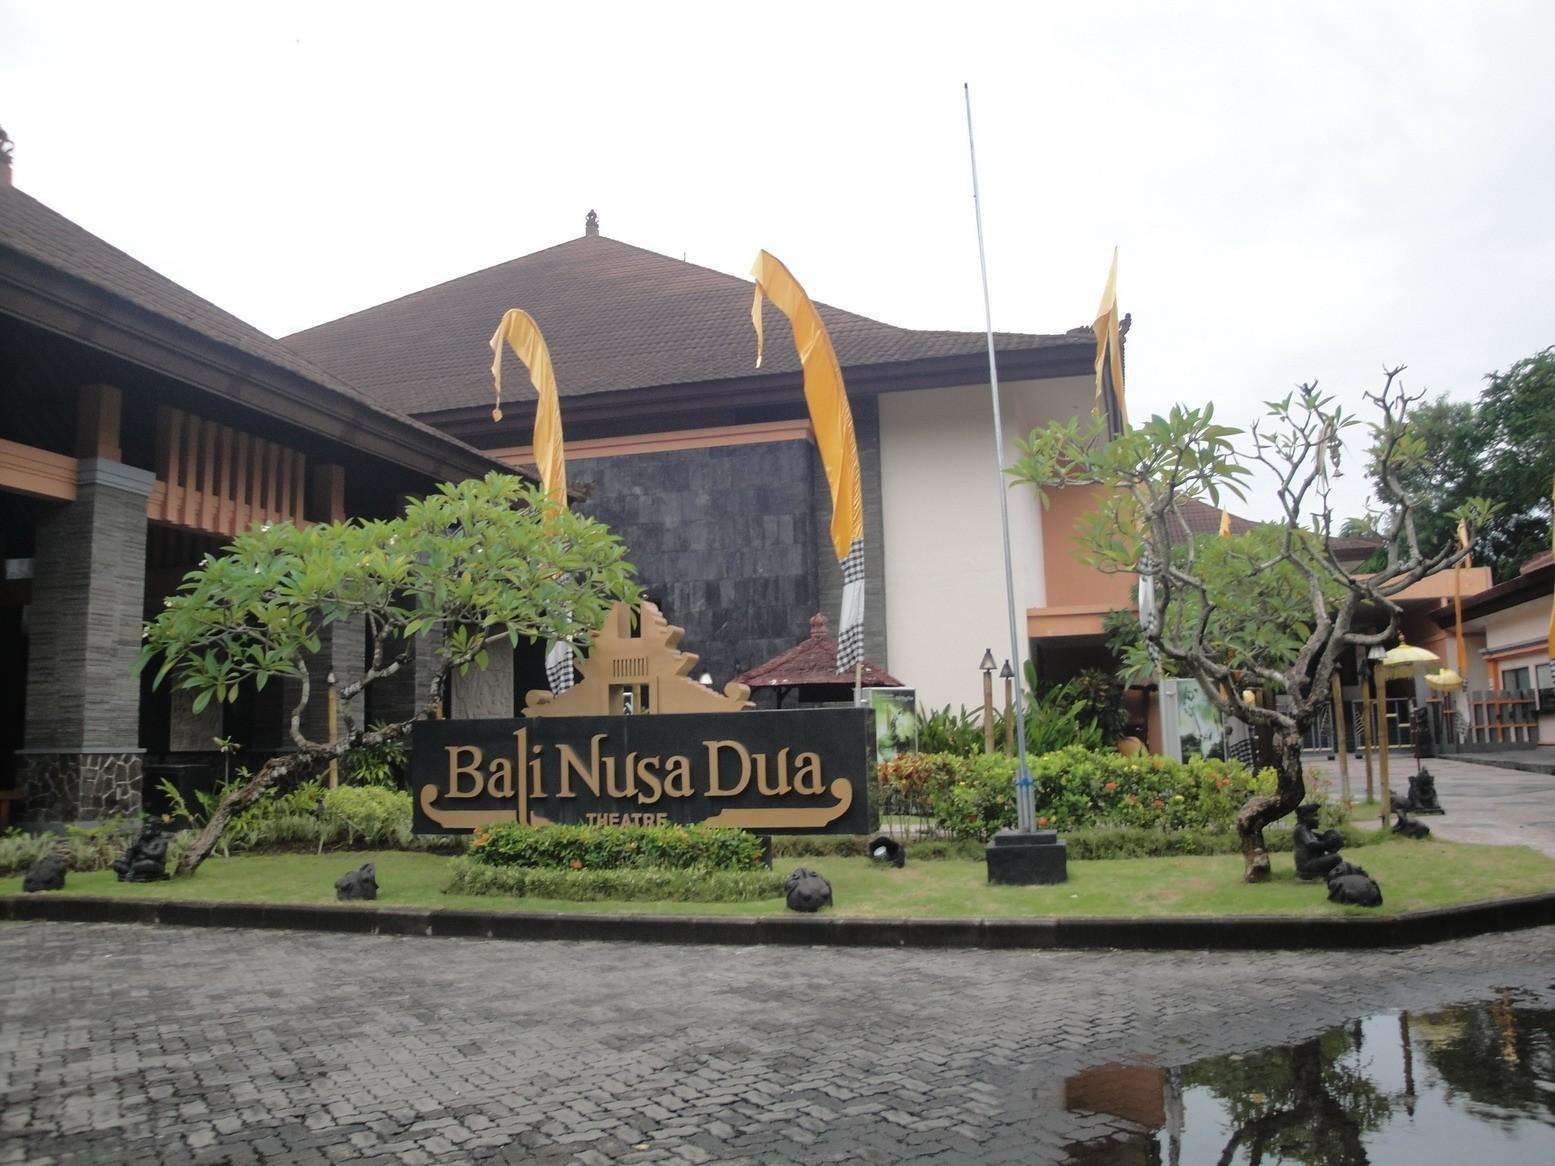 Театр Девдан (Devdan) Нуса Дуа Бали